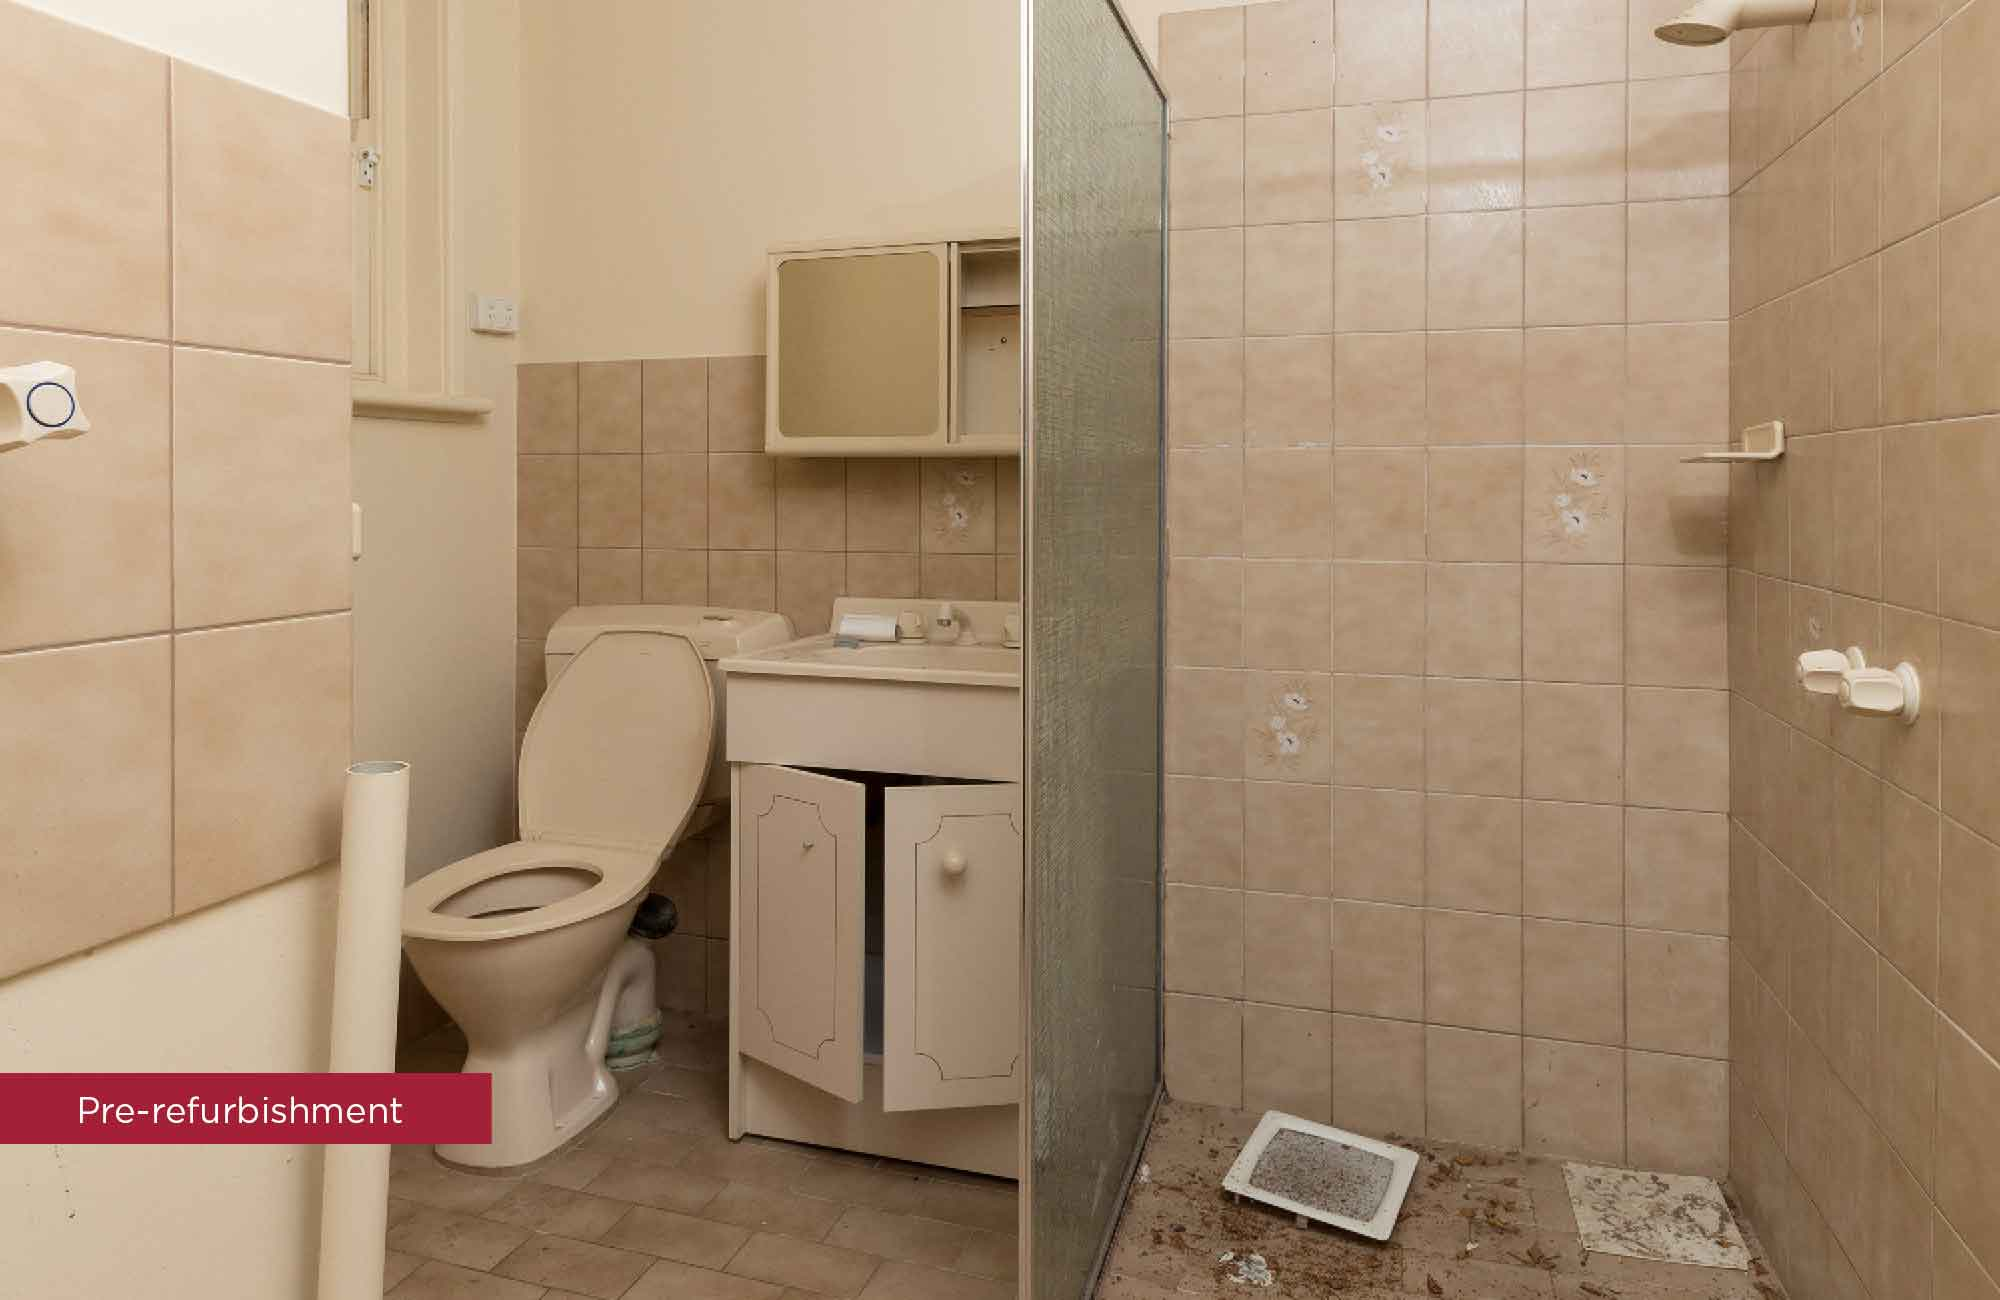 Pre-refurbishment of bathroom